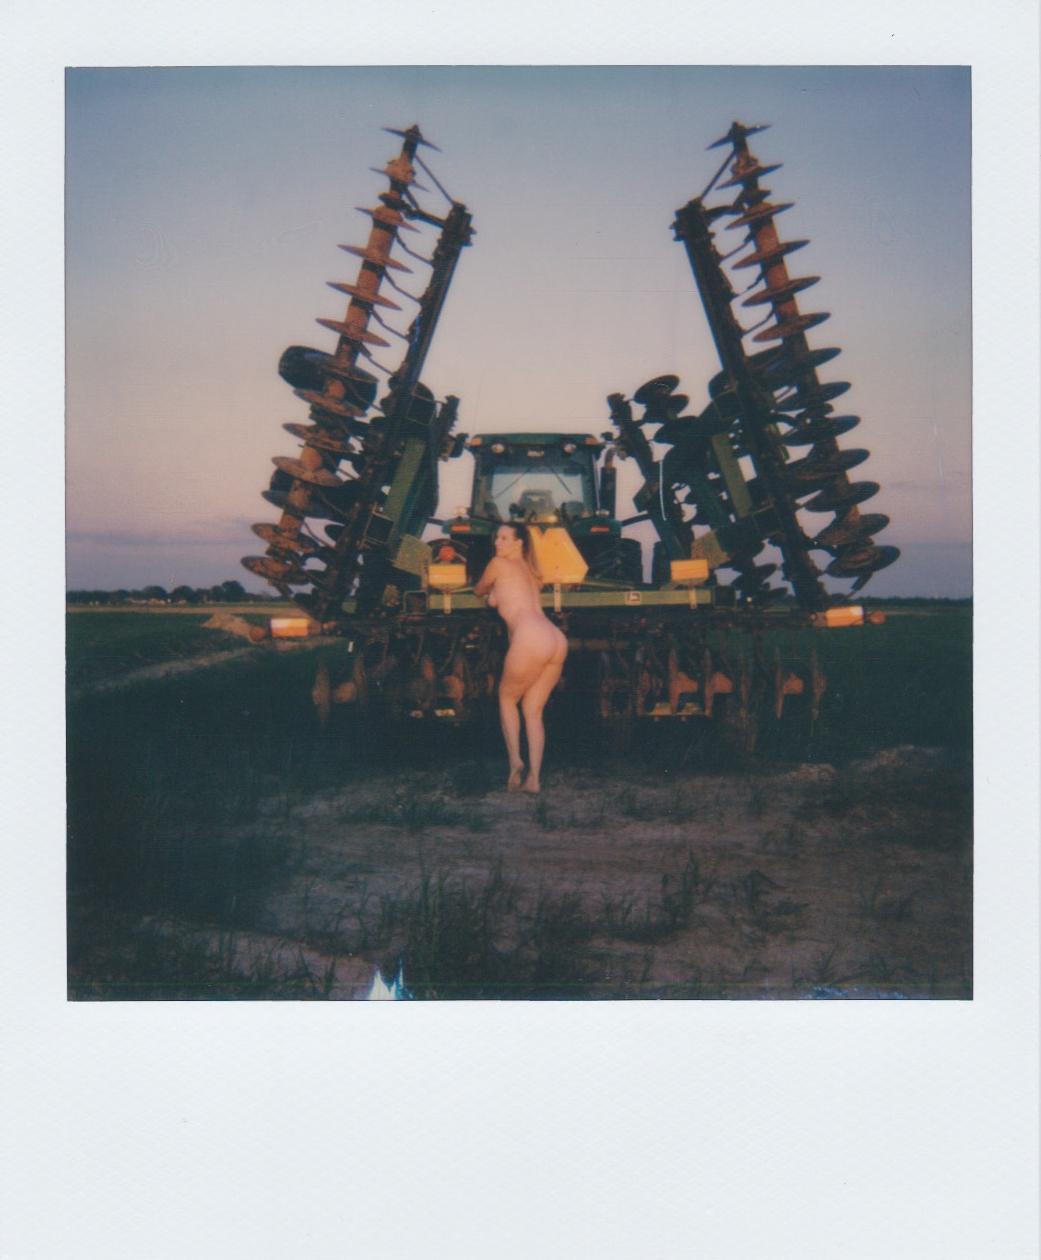 Polaroid project Day 2-7 by JW Purdy